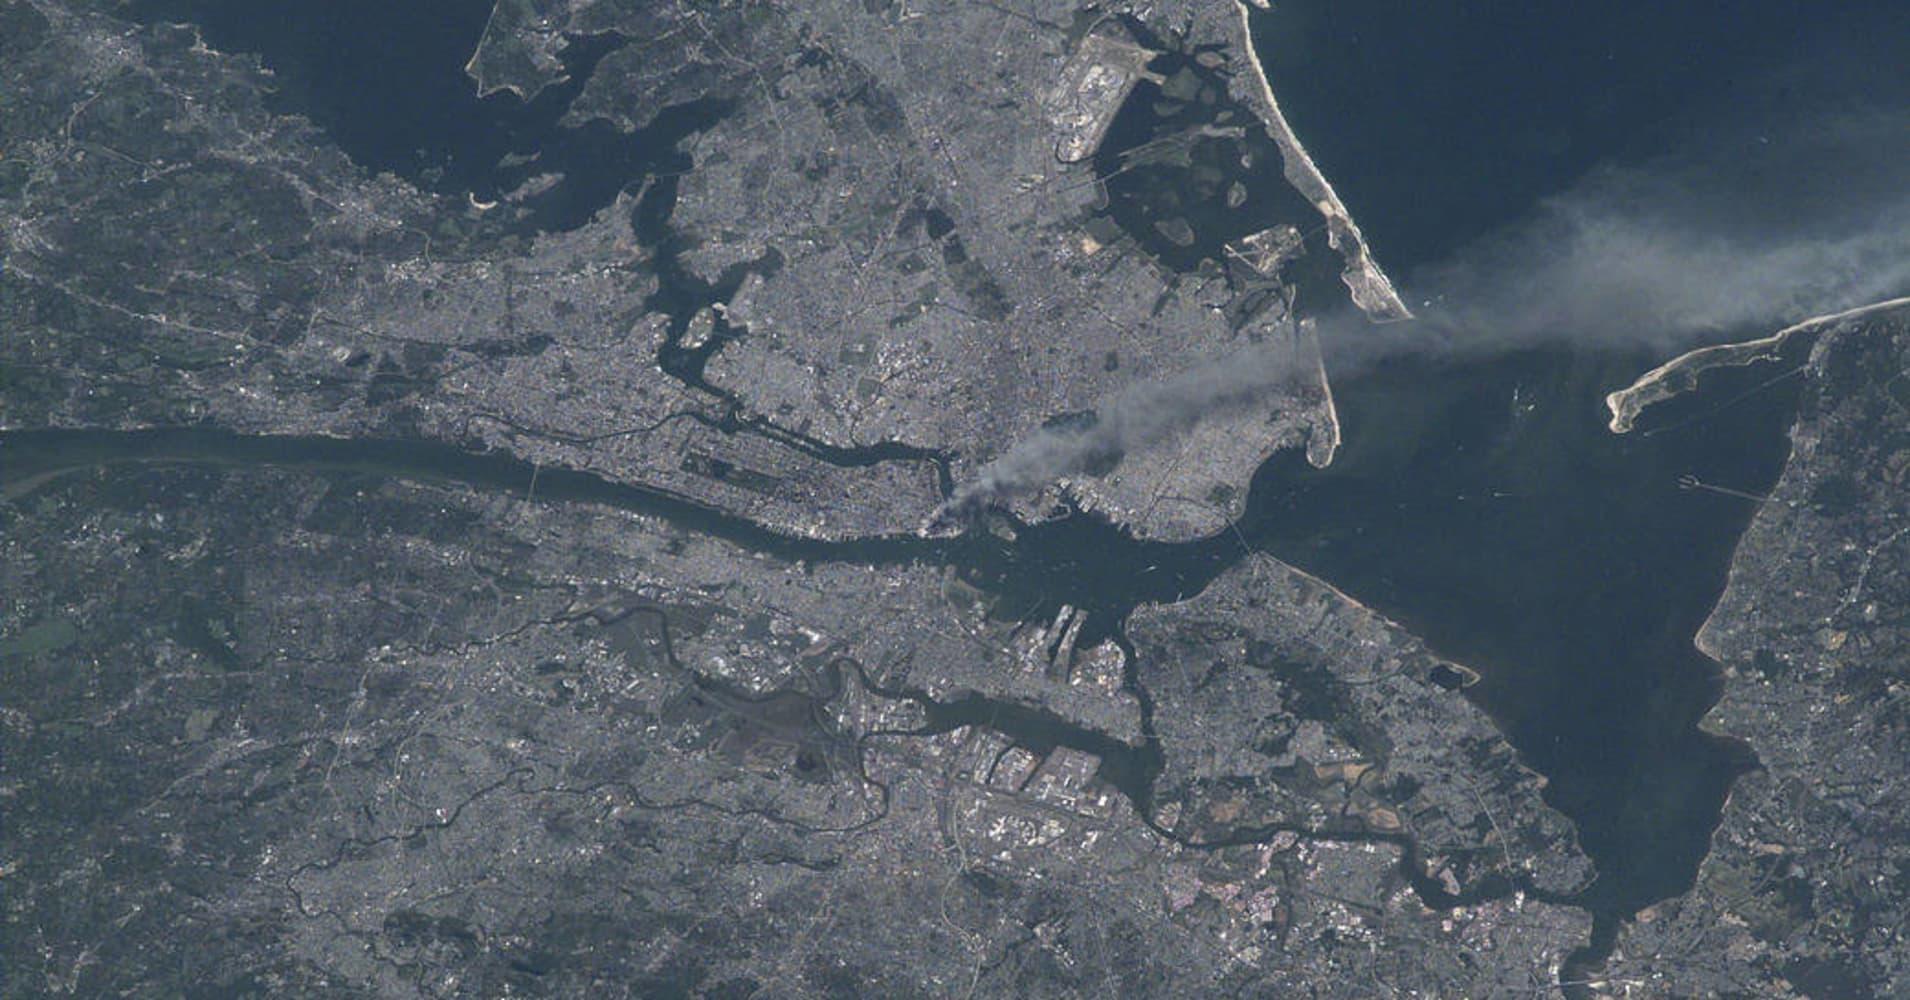 New York City on Sept. 11, 2001.